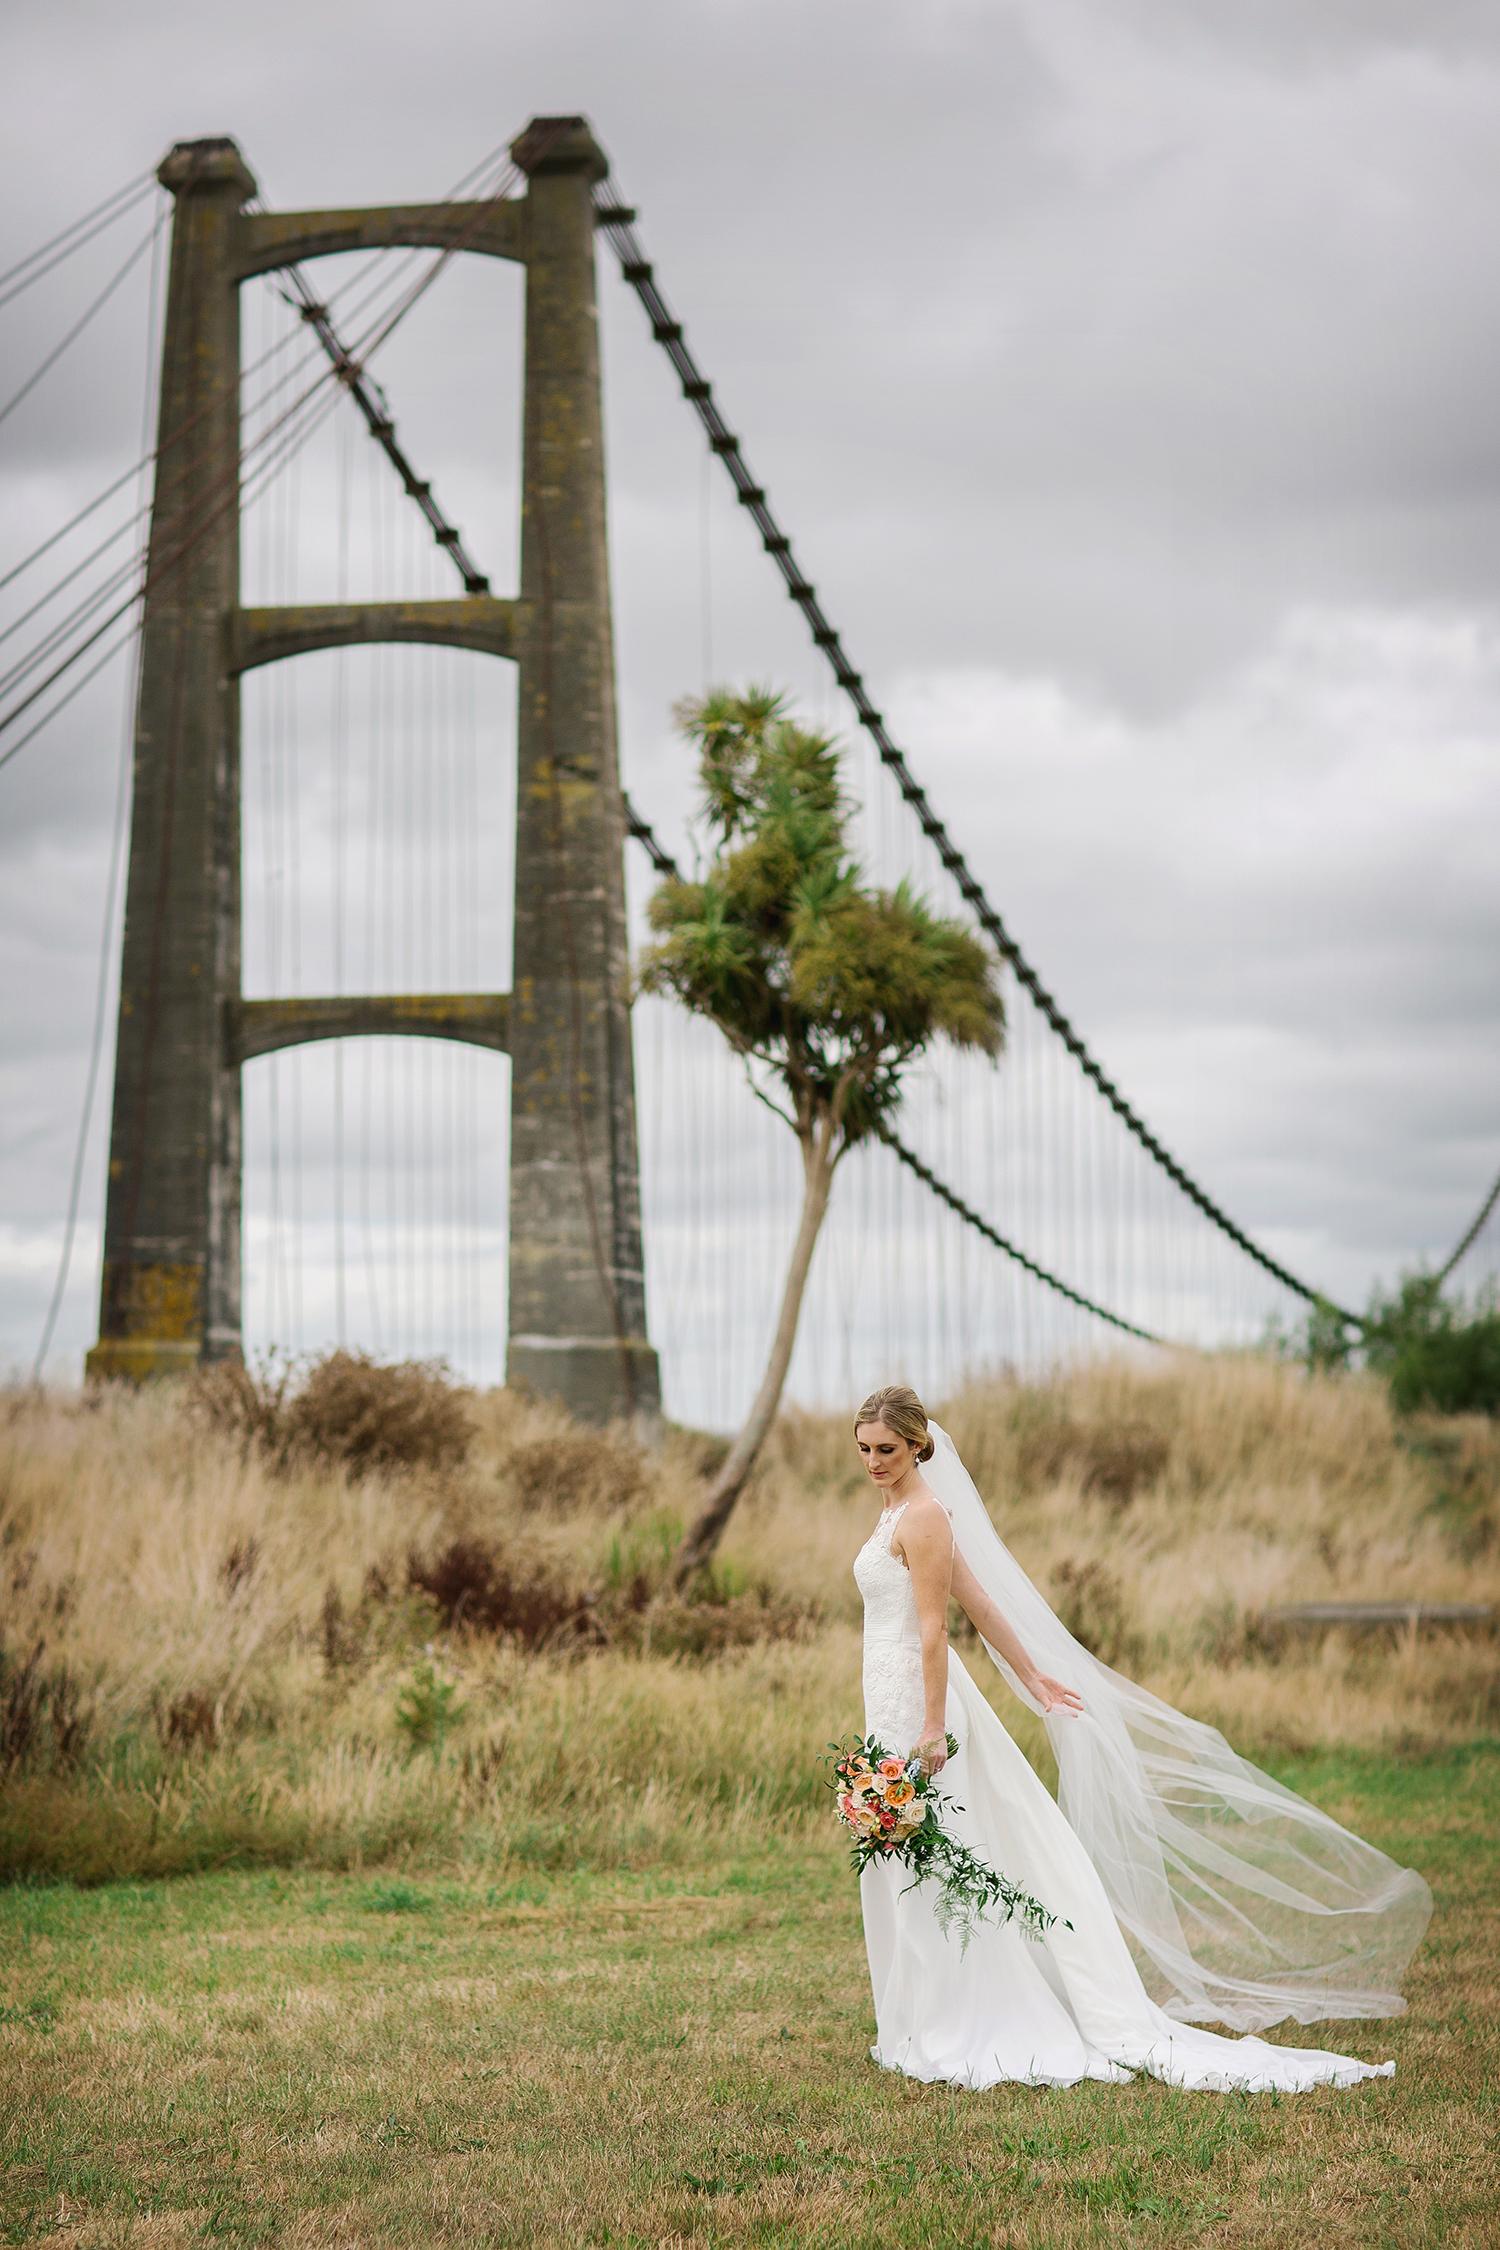 Toni-Larsen-Katie+Willy-Wedding-11.jpg